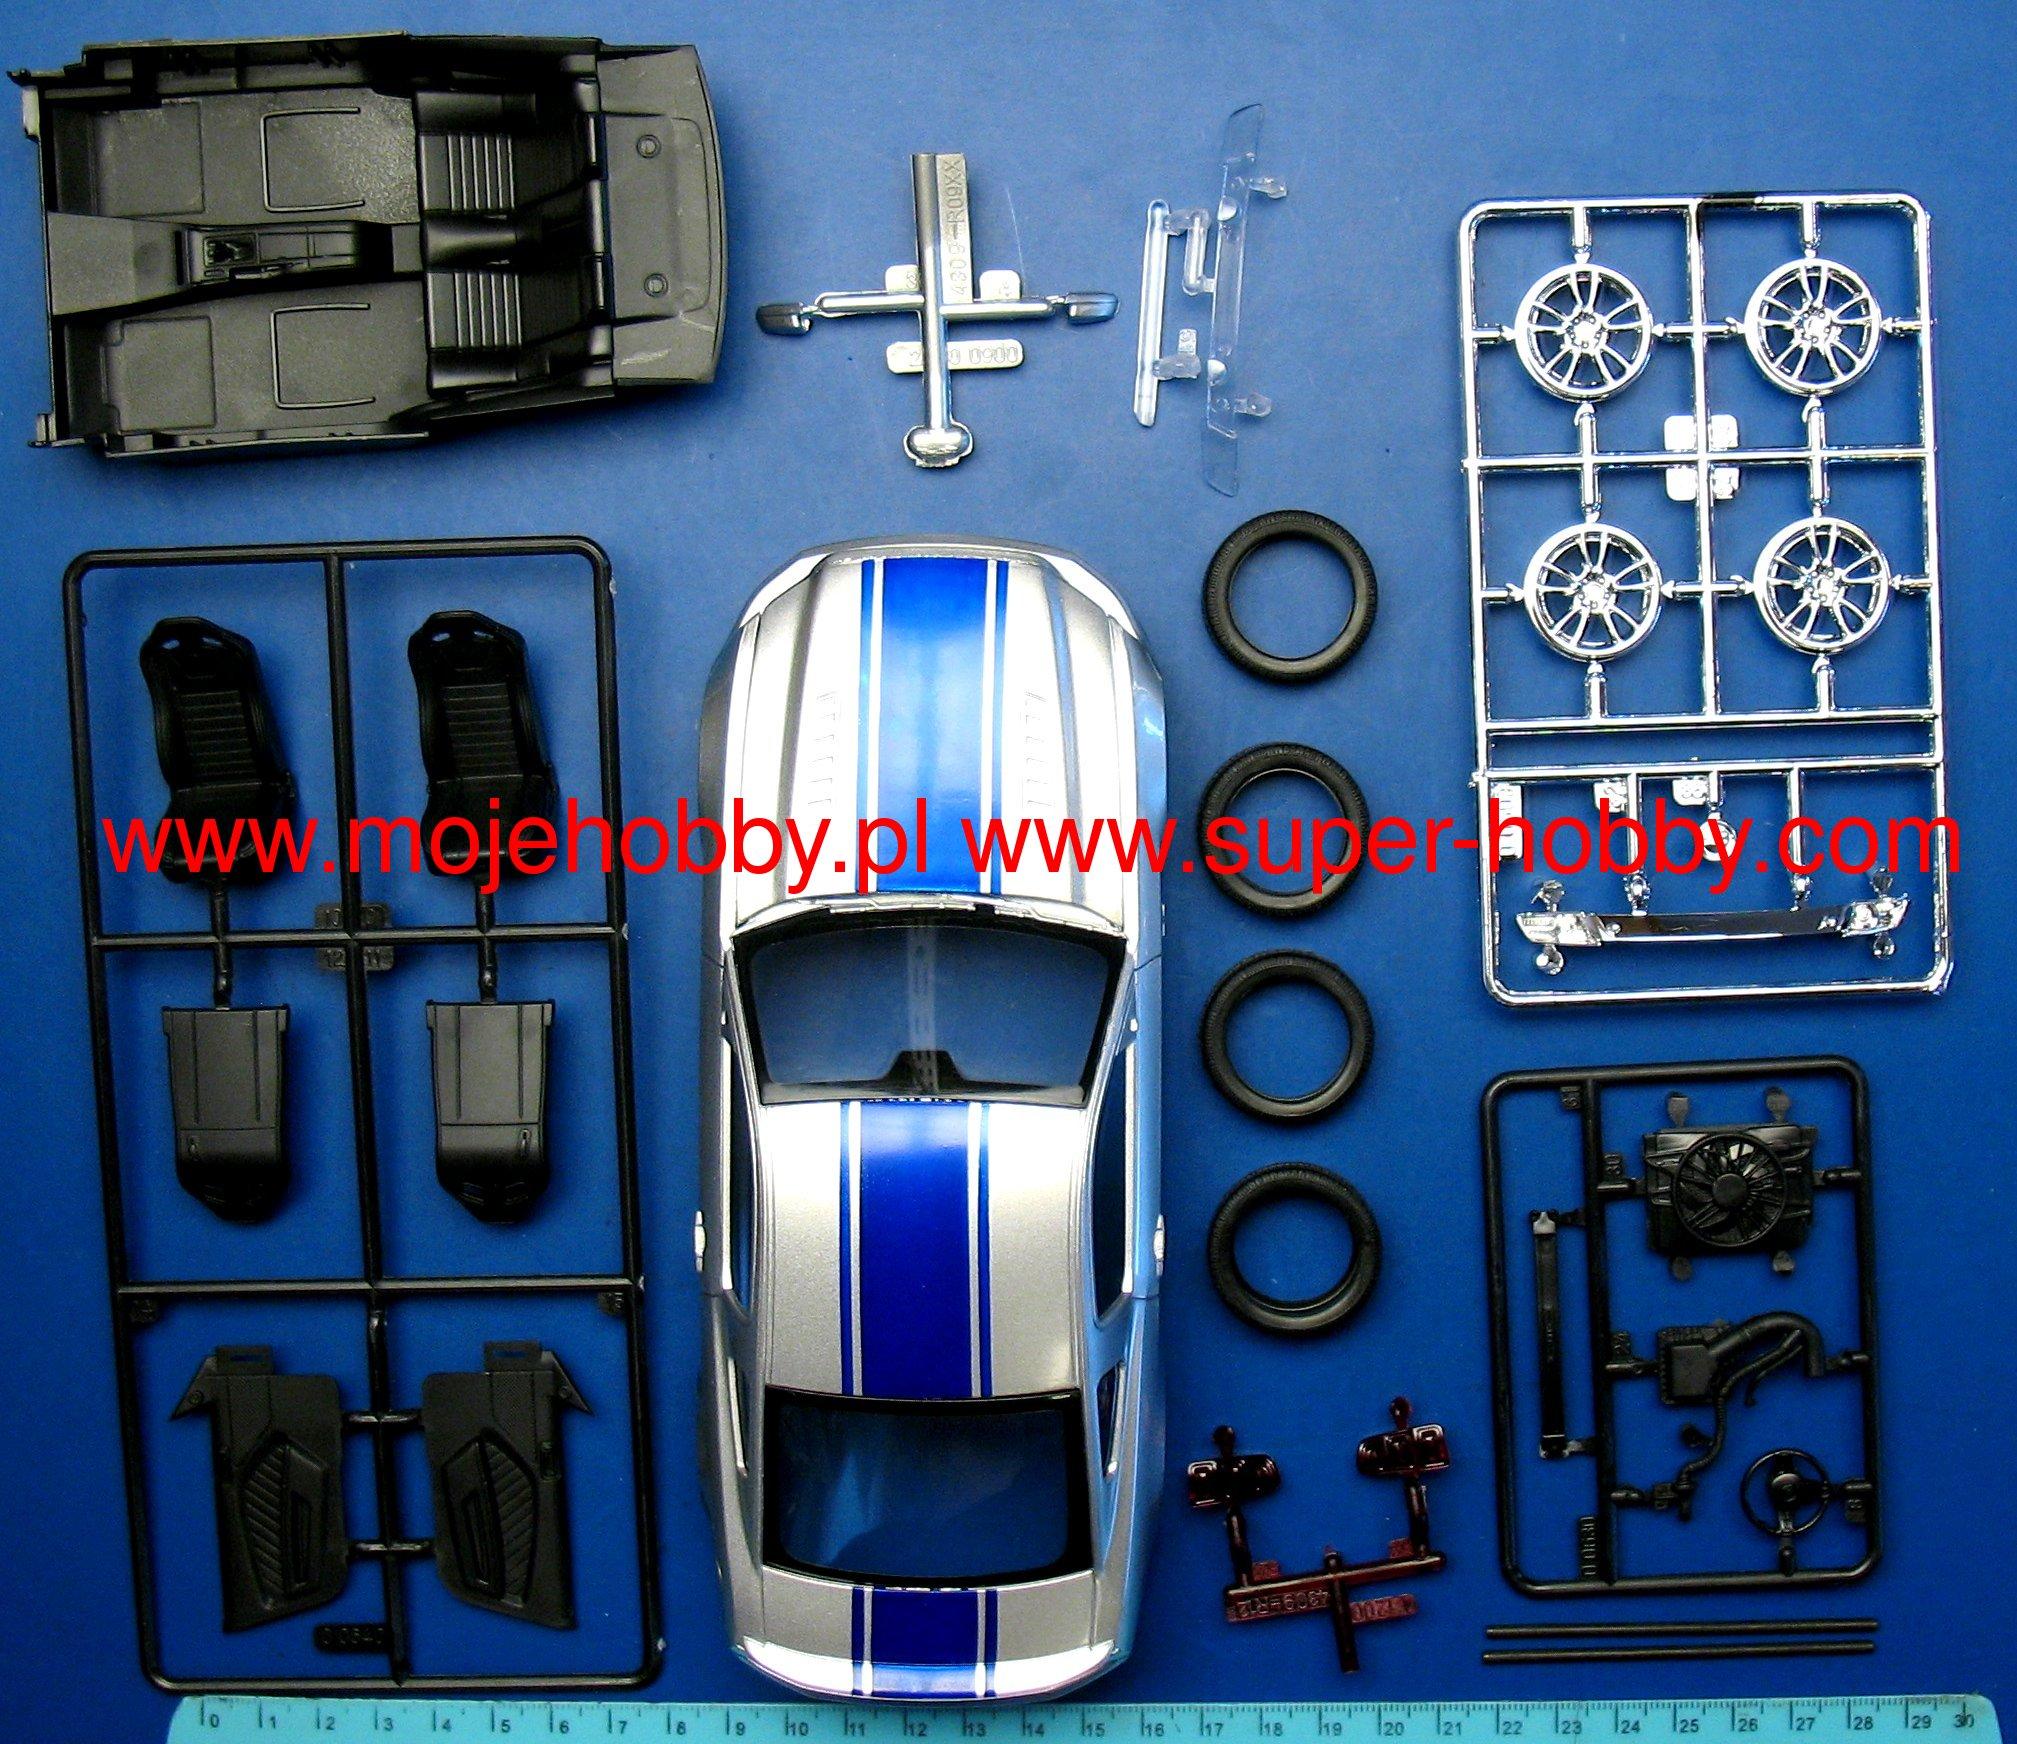 2014 Ford Mustang GT - Image 1_rev07061_1.jpg